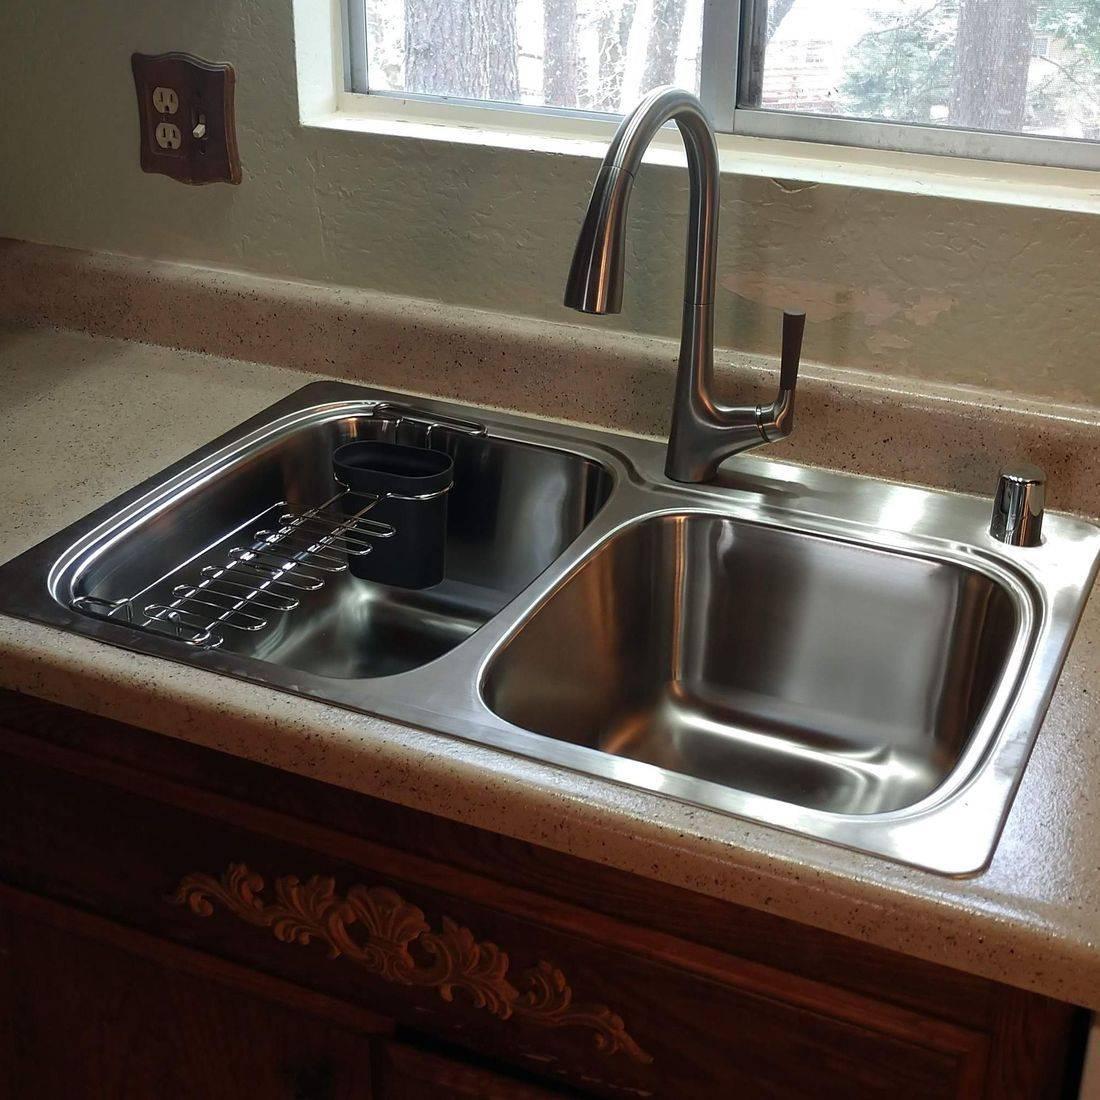 New Kitchen Counter-top & Sink